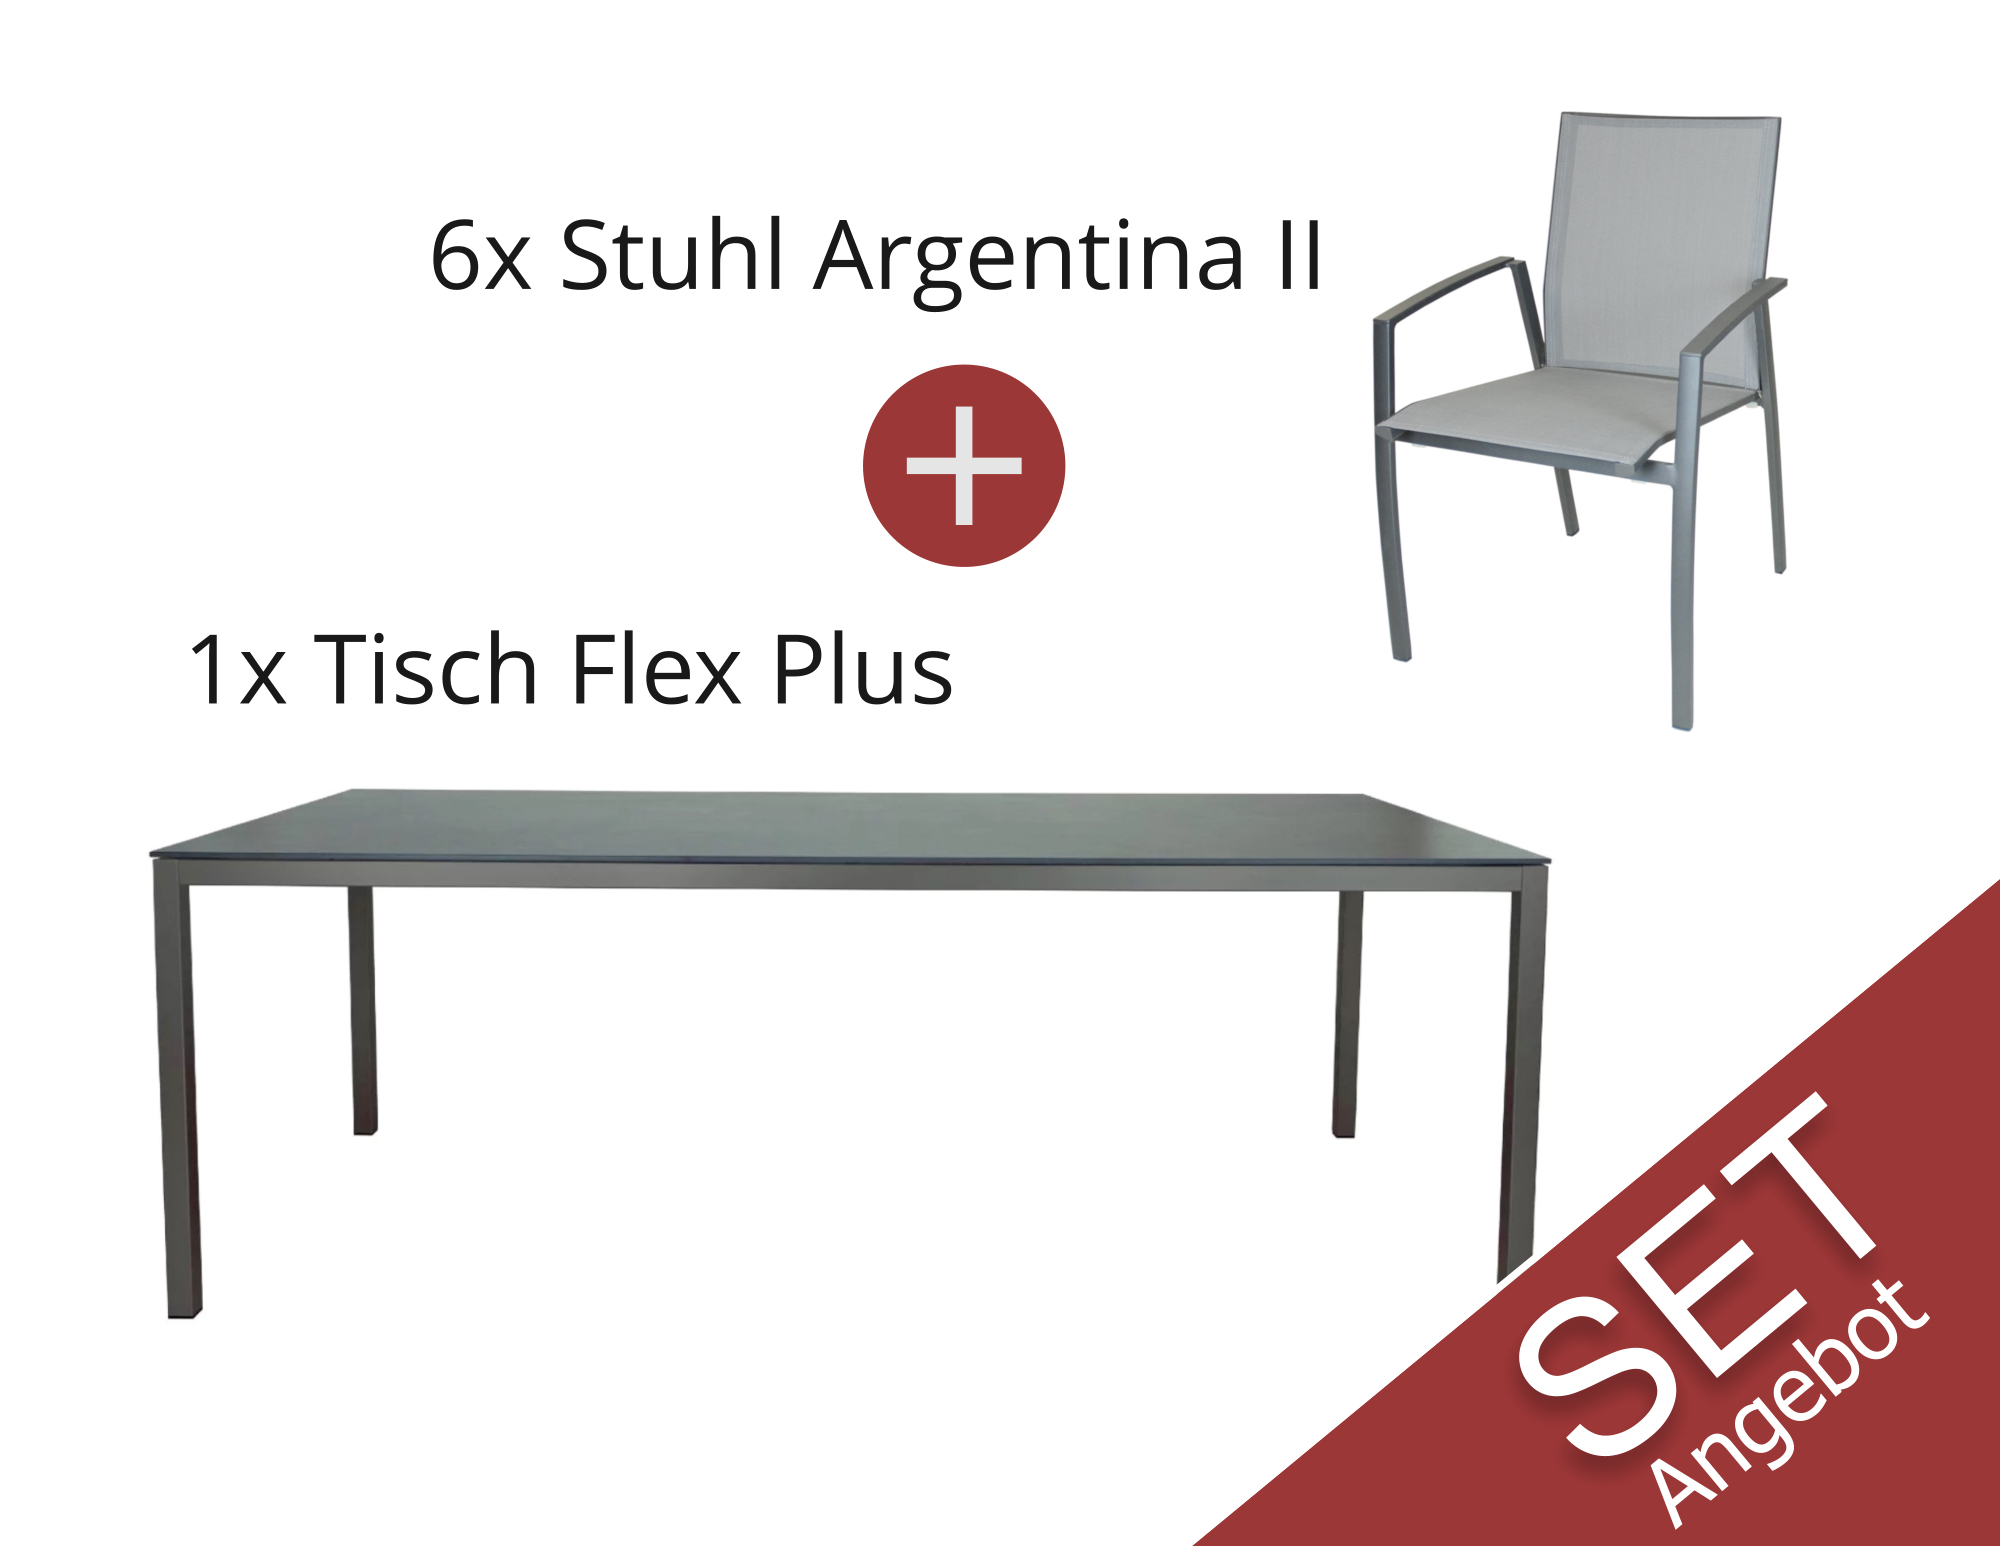 Aktions-Set: Flex Plus (Bluestone) / Argentina